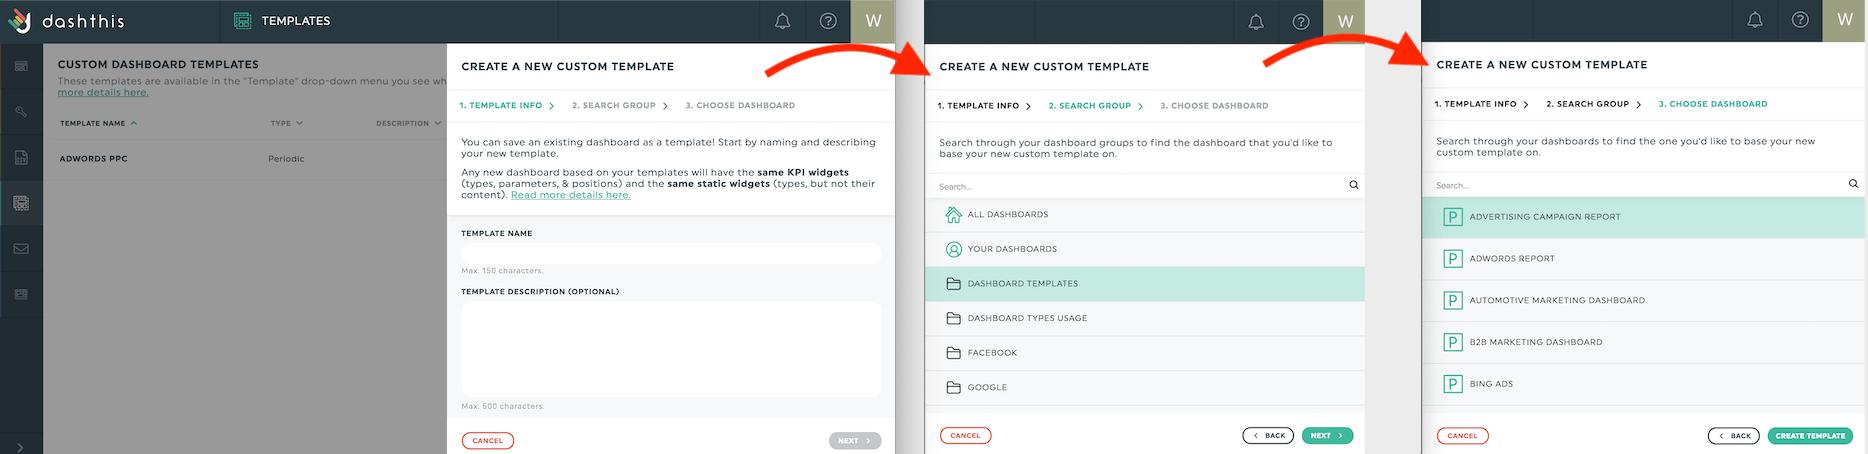 New custom templates